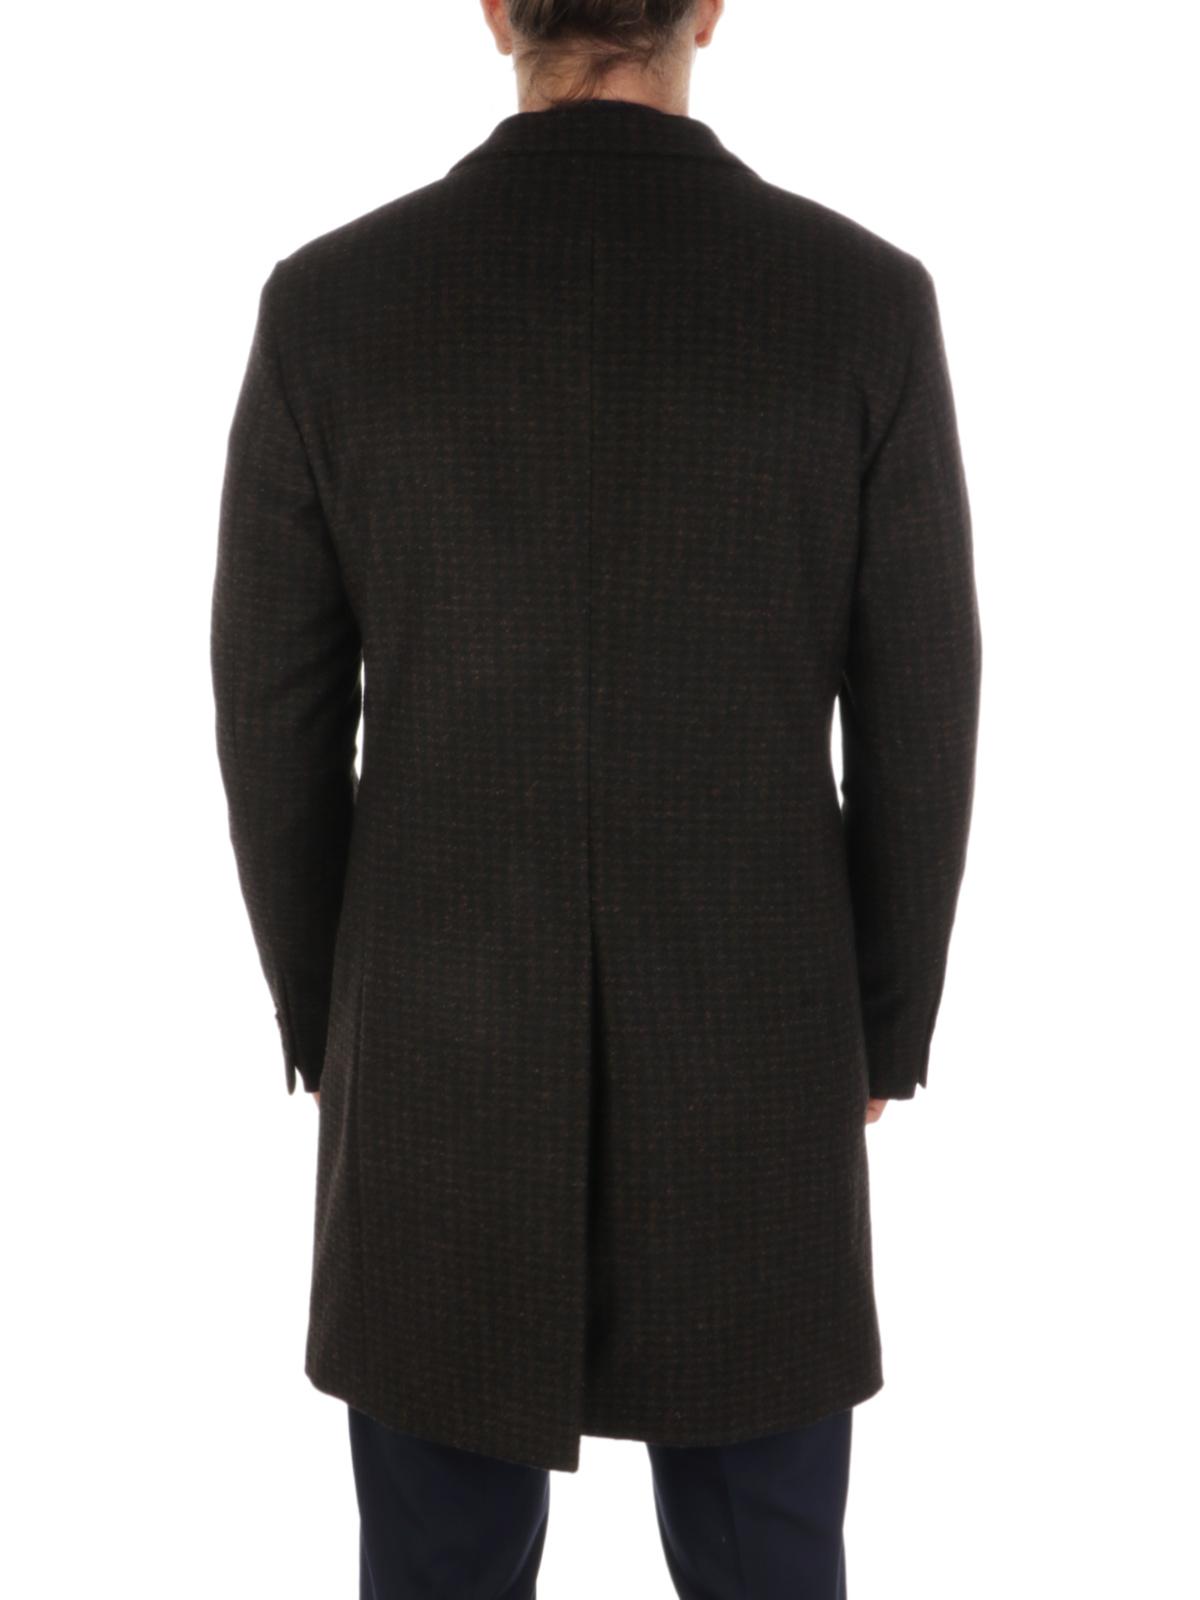 Picture of LBM 1911 | Men's Houndstooth Wool Coat